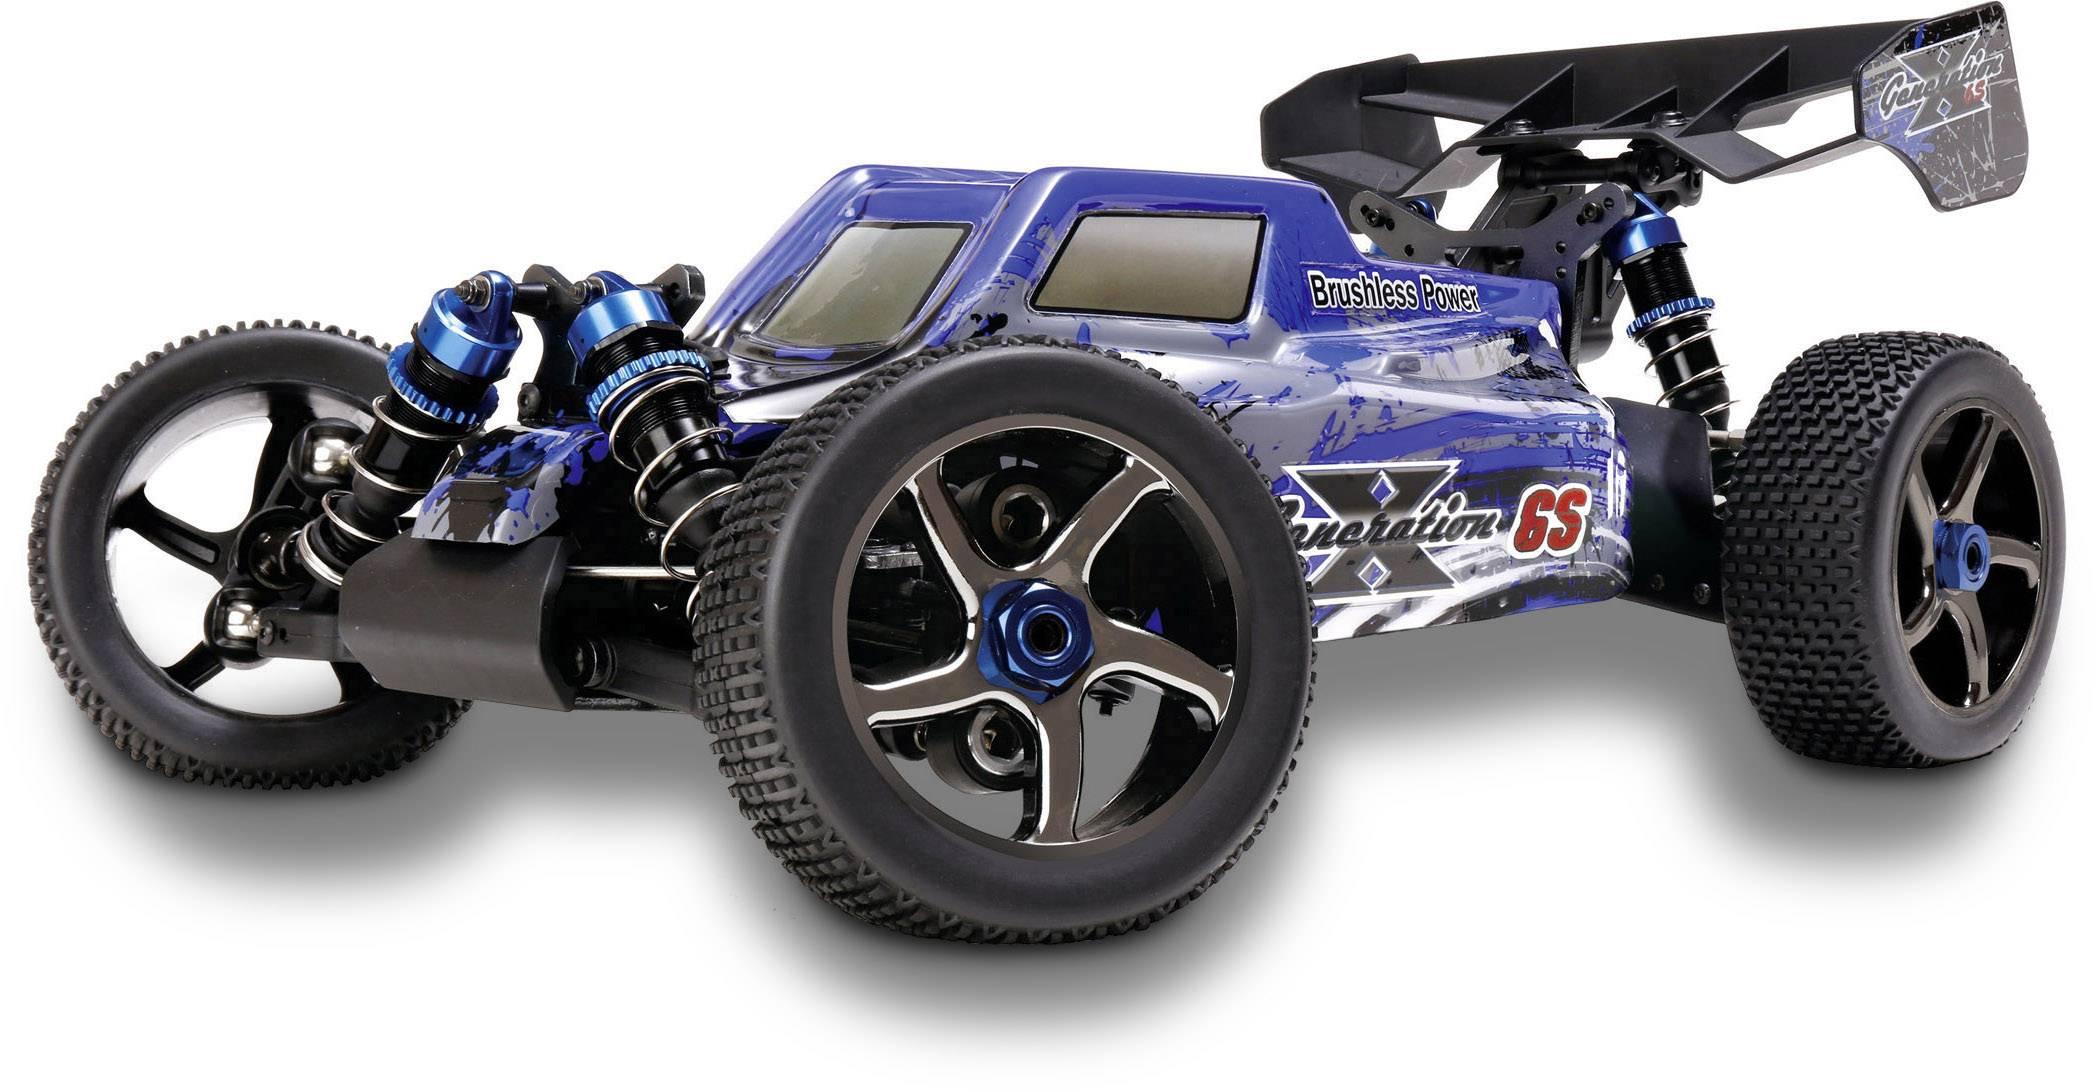 Reely Bulldog 2S Brushless 1:10 RC Modellauto Elektro Buggy Allradantrieb RtR 2,